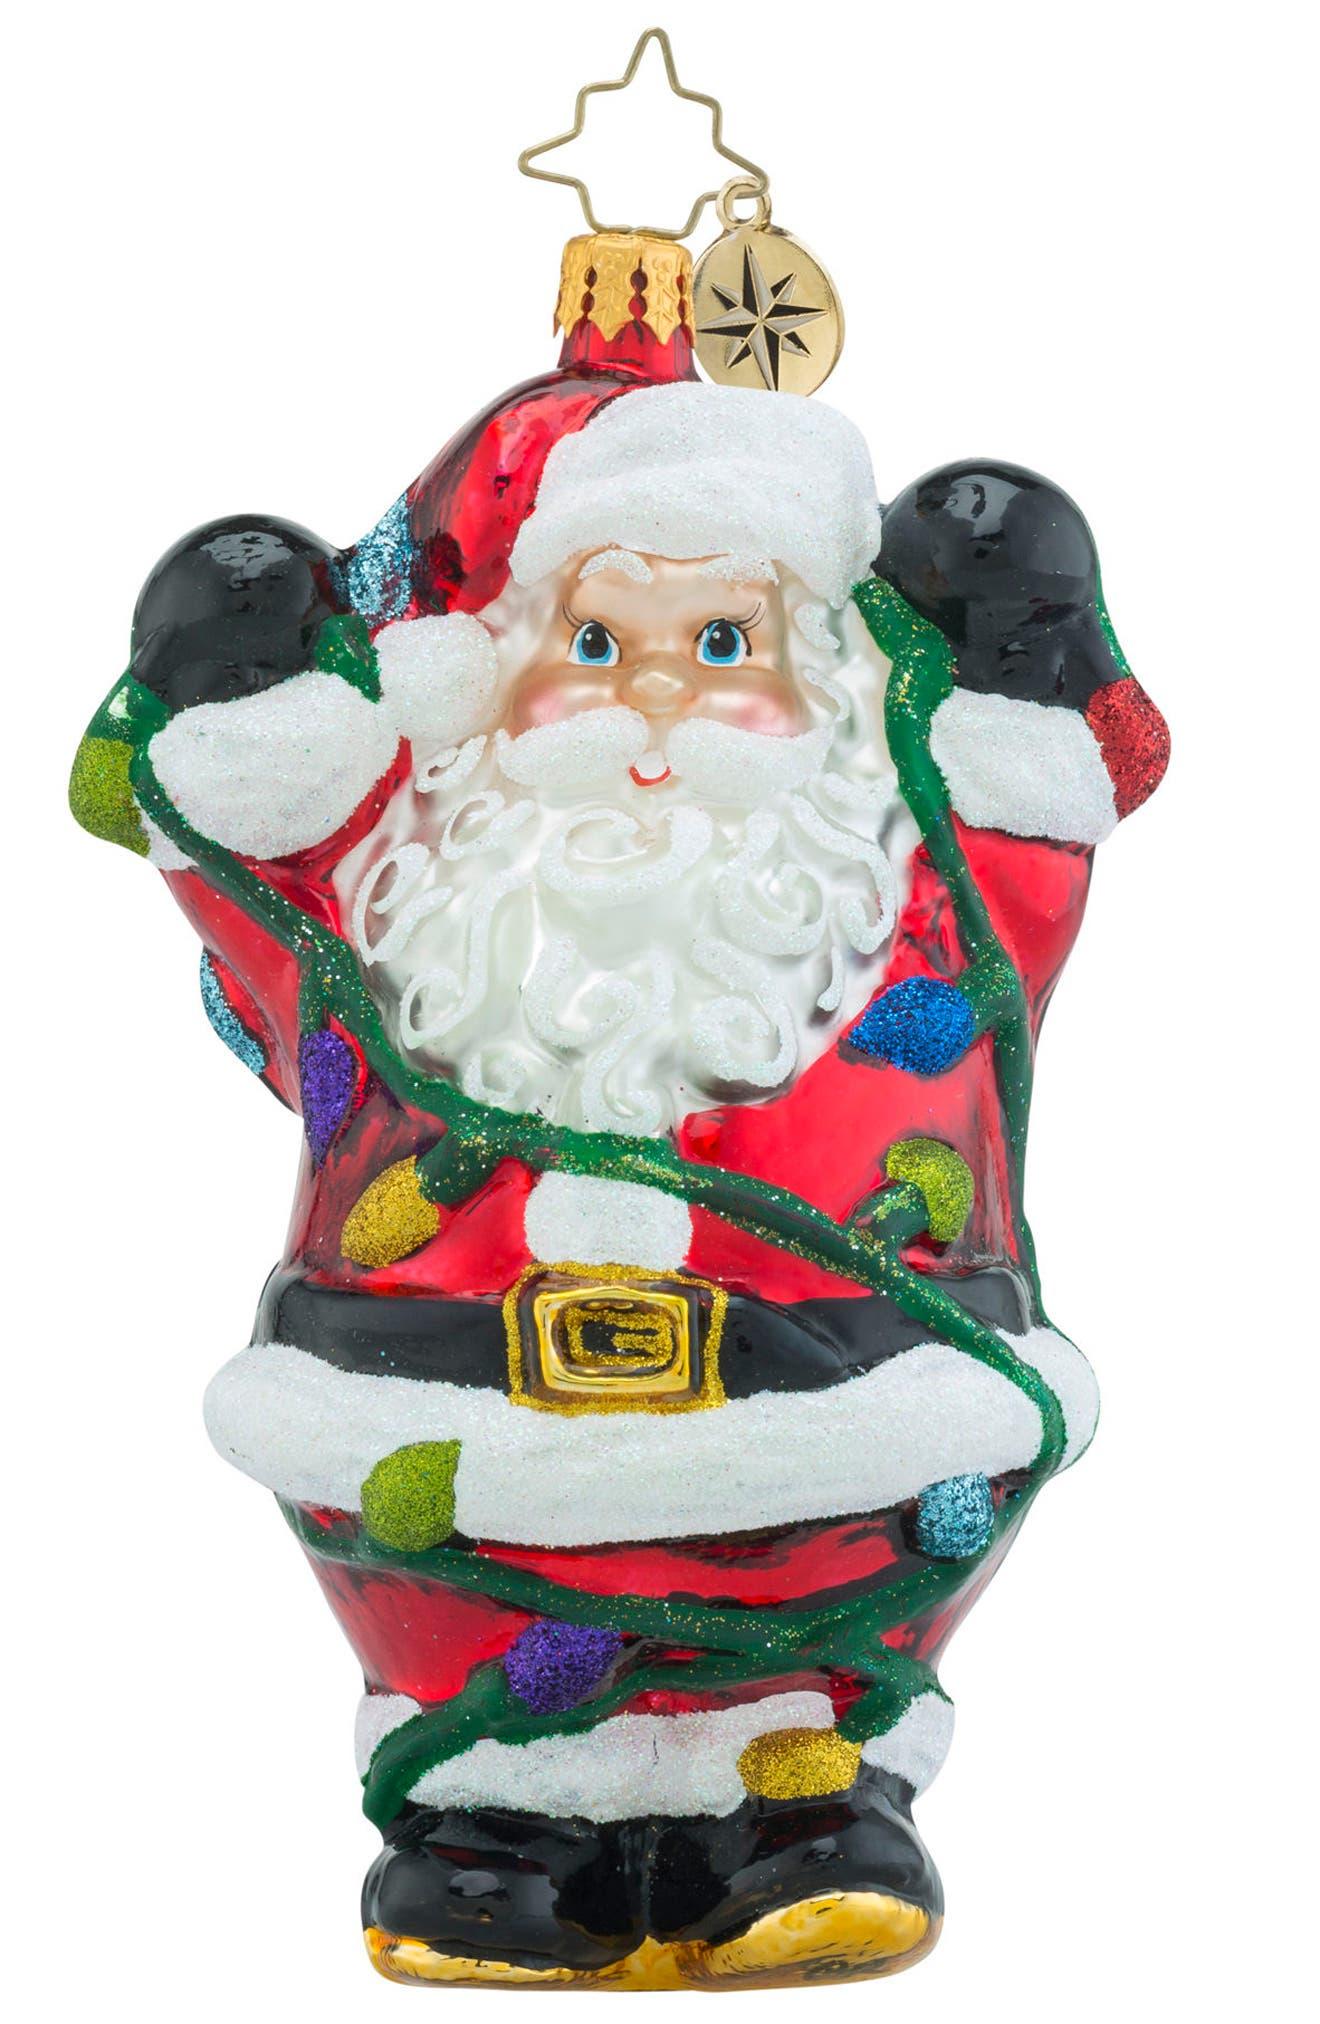 Tangles Tidings Ornament,                         Main,                         color,